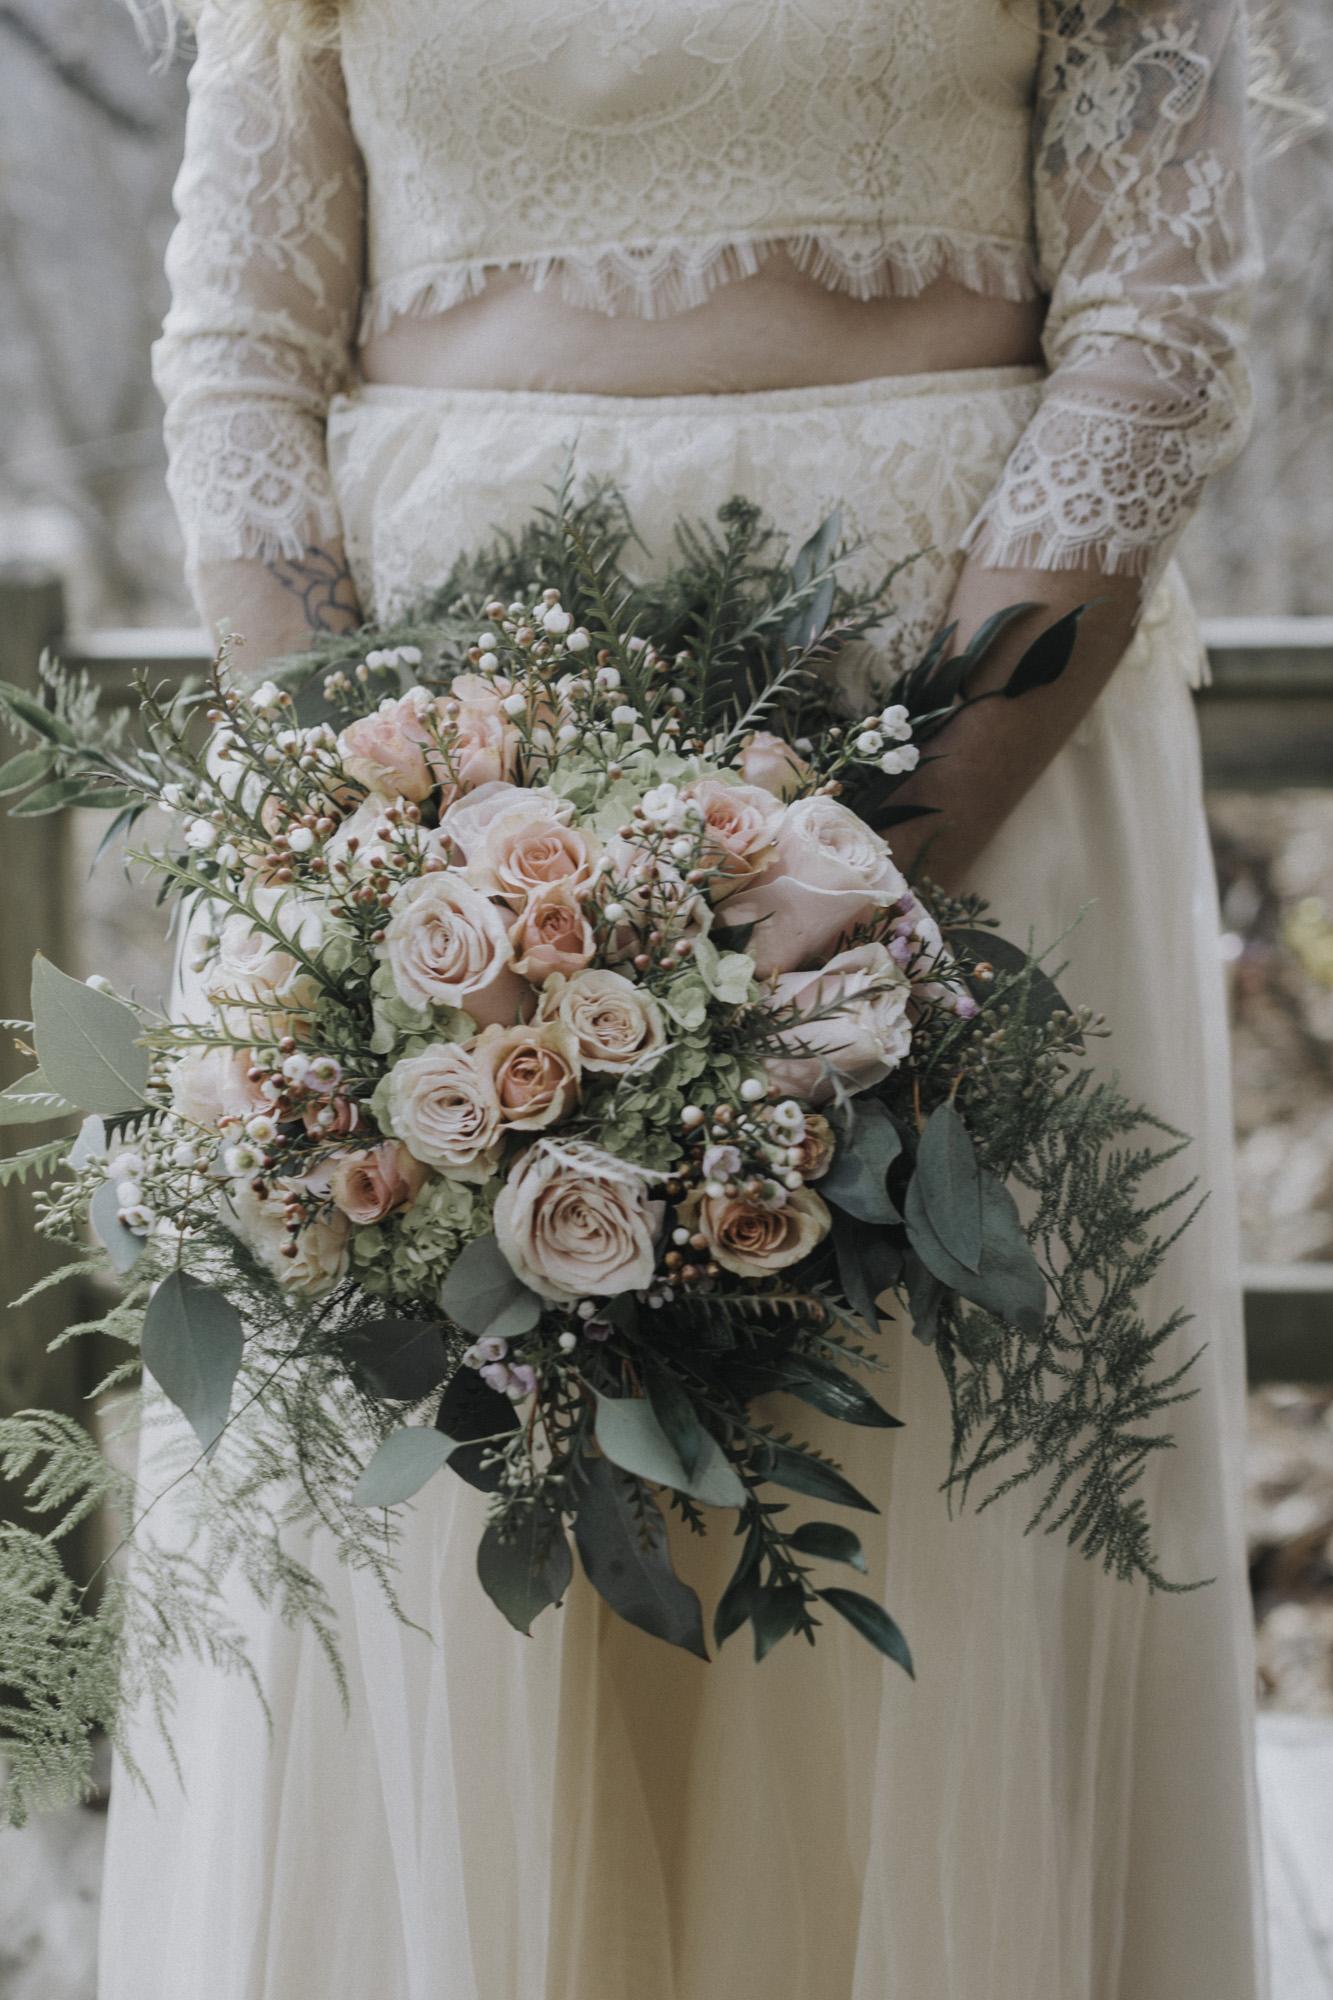 Cate_Ann_Photography_Dayton_Ohio_Wedding_Elopement_And_Engagement_PhotographerDSC_5710.jpg